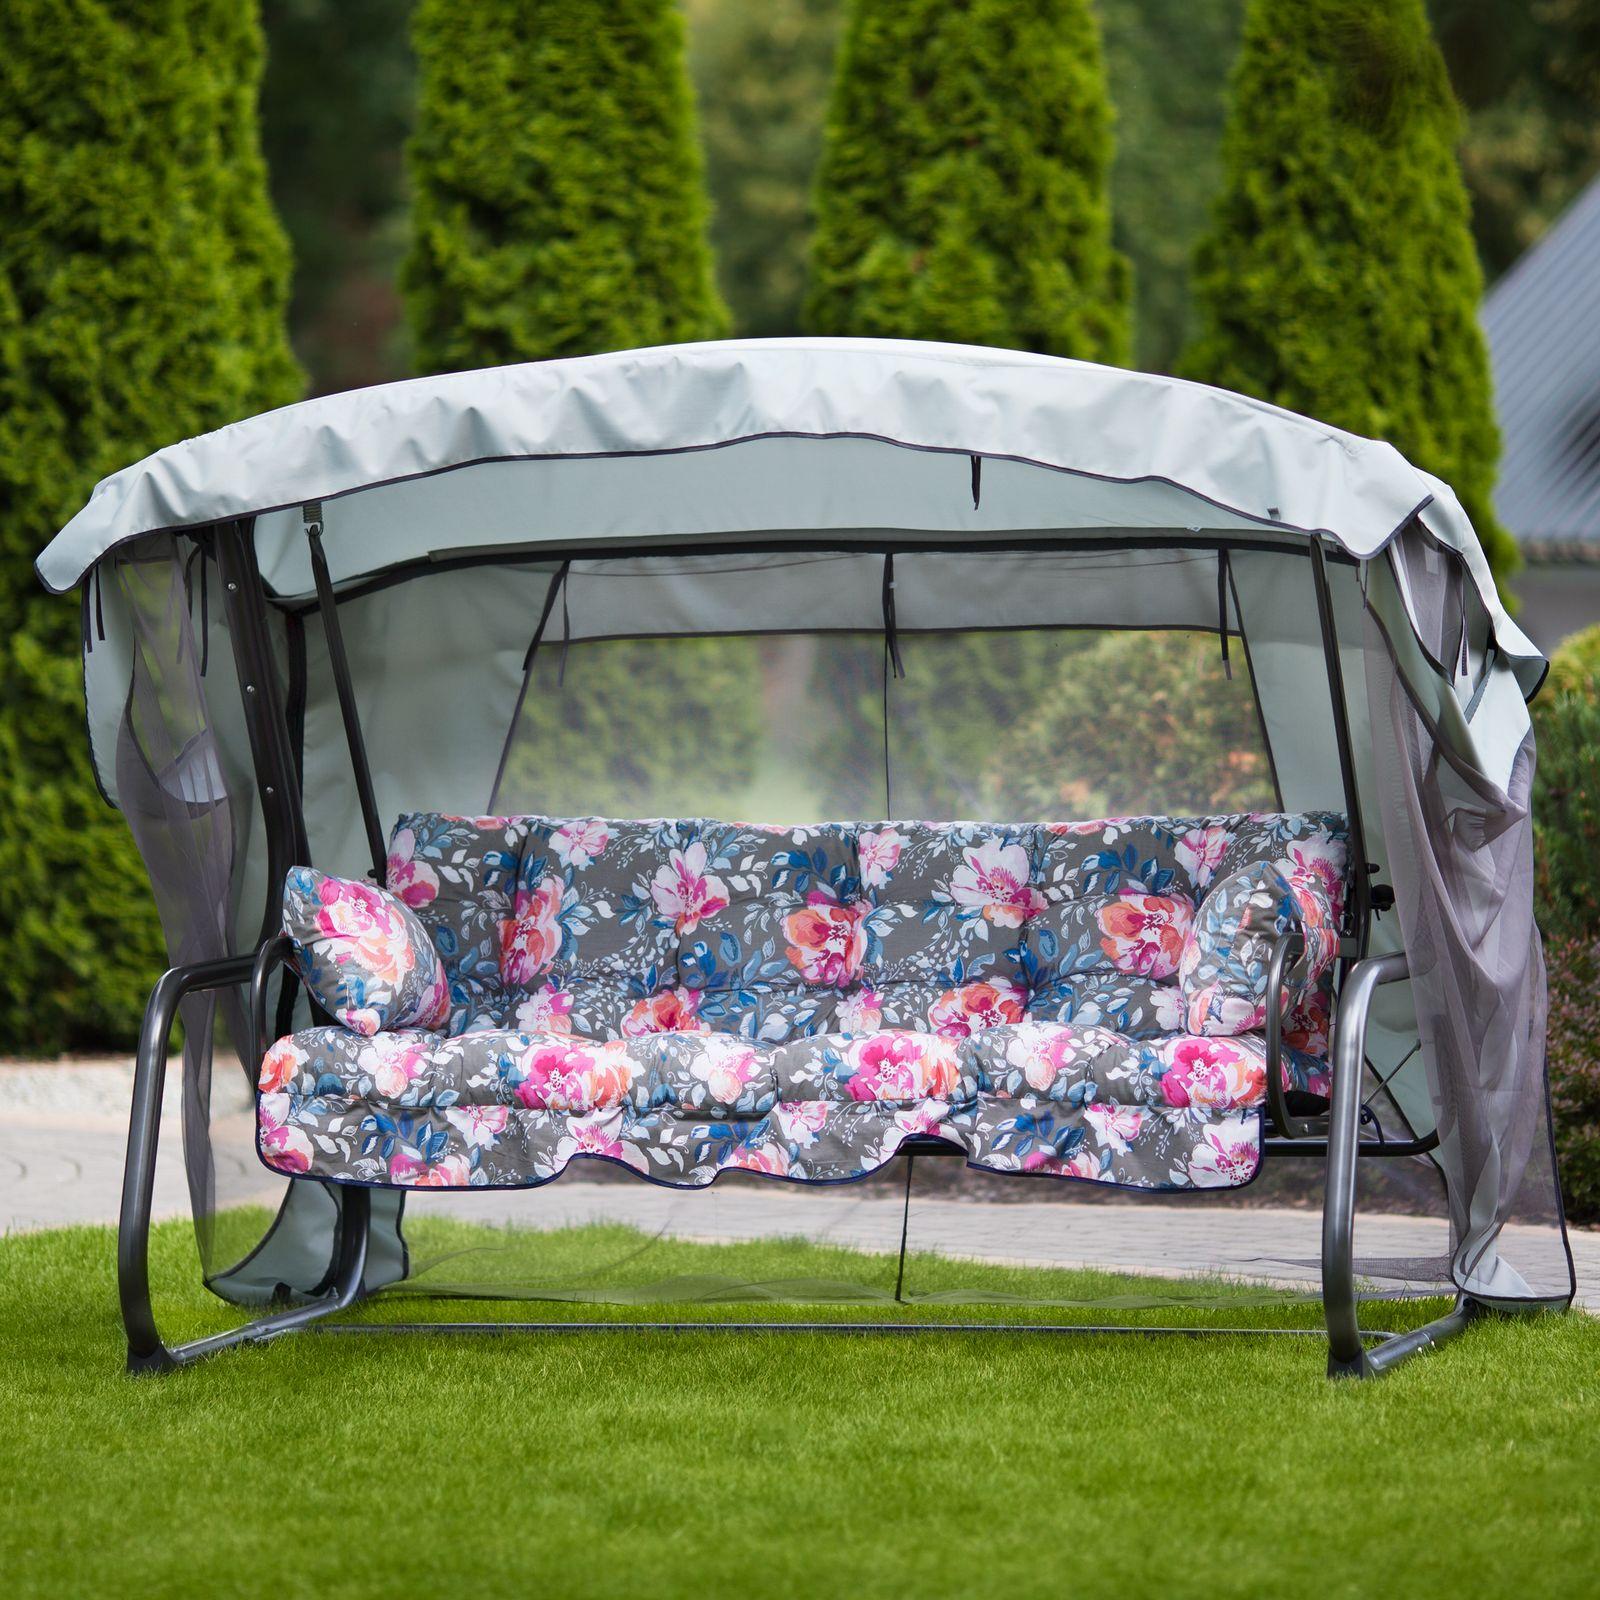 Balancín de jardín con mosquitera Ravenna Lux A091-23PB PATIO